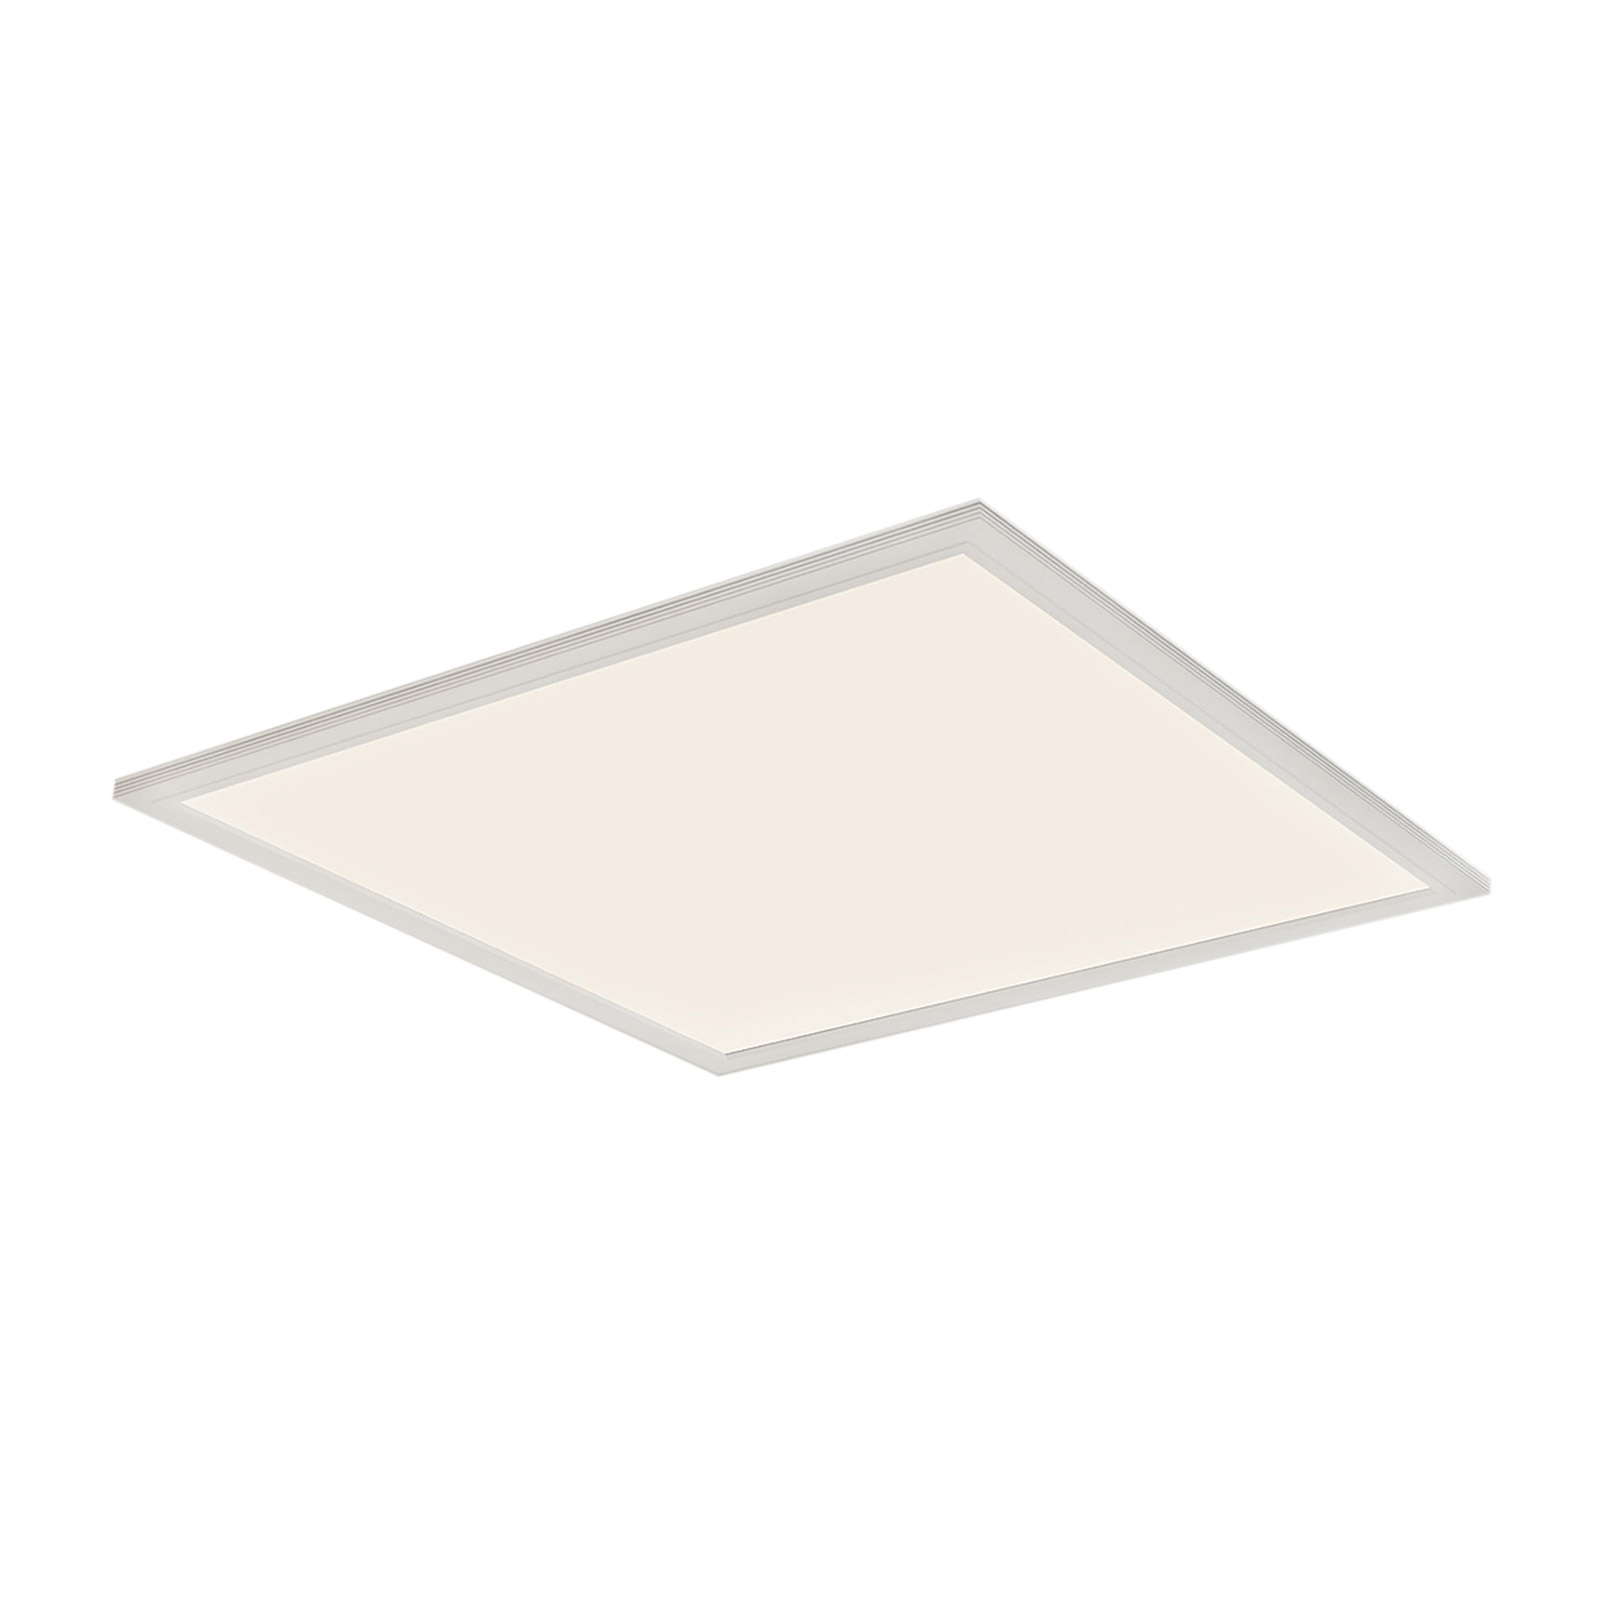 LED-Deckenlampe 7188-016 mit Sensor, 59,5x59,5cm